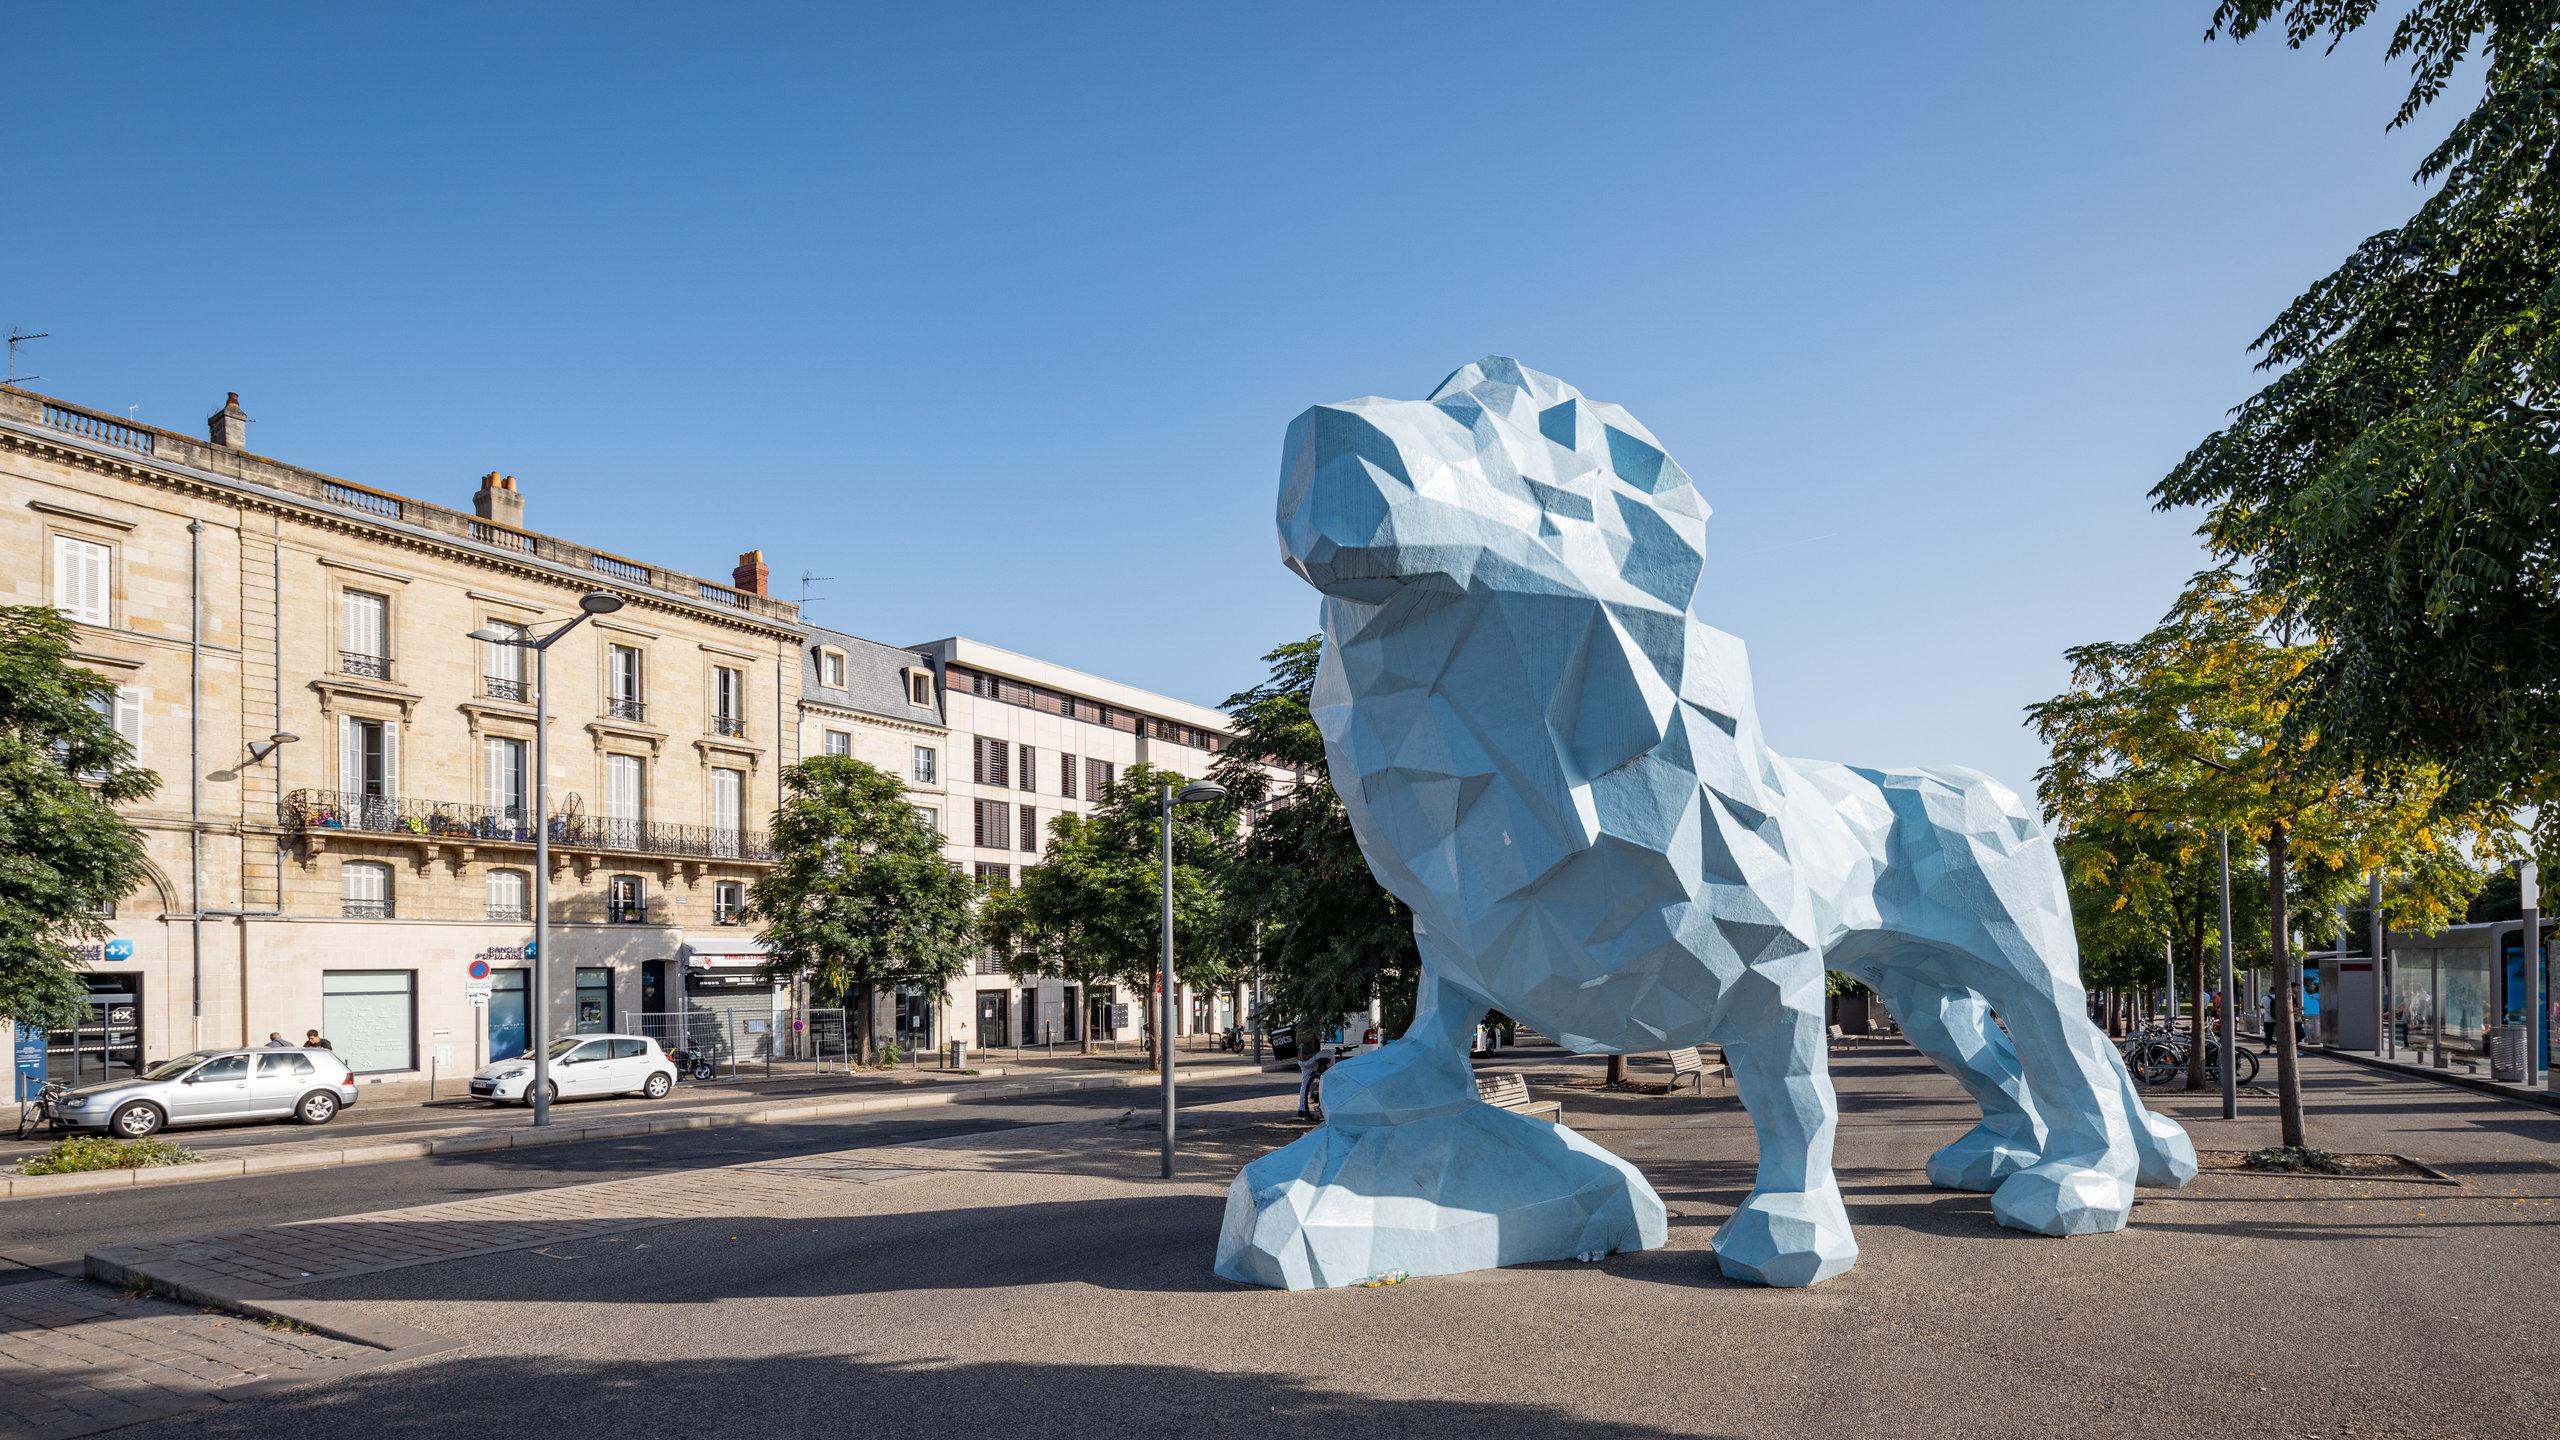 Bastide, Bordeaux, Gironde, France